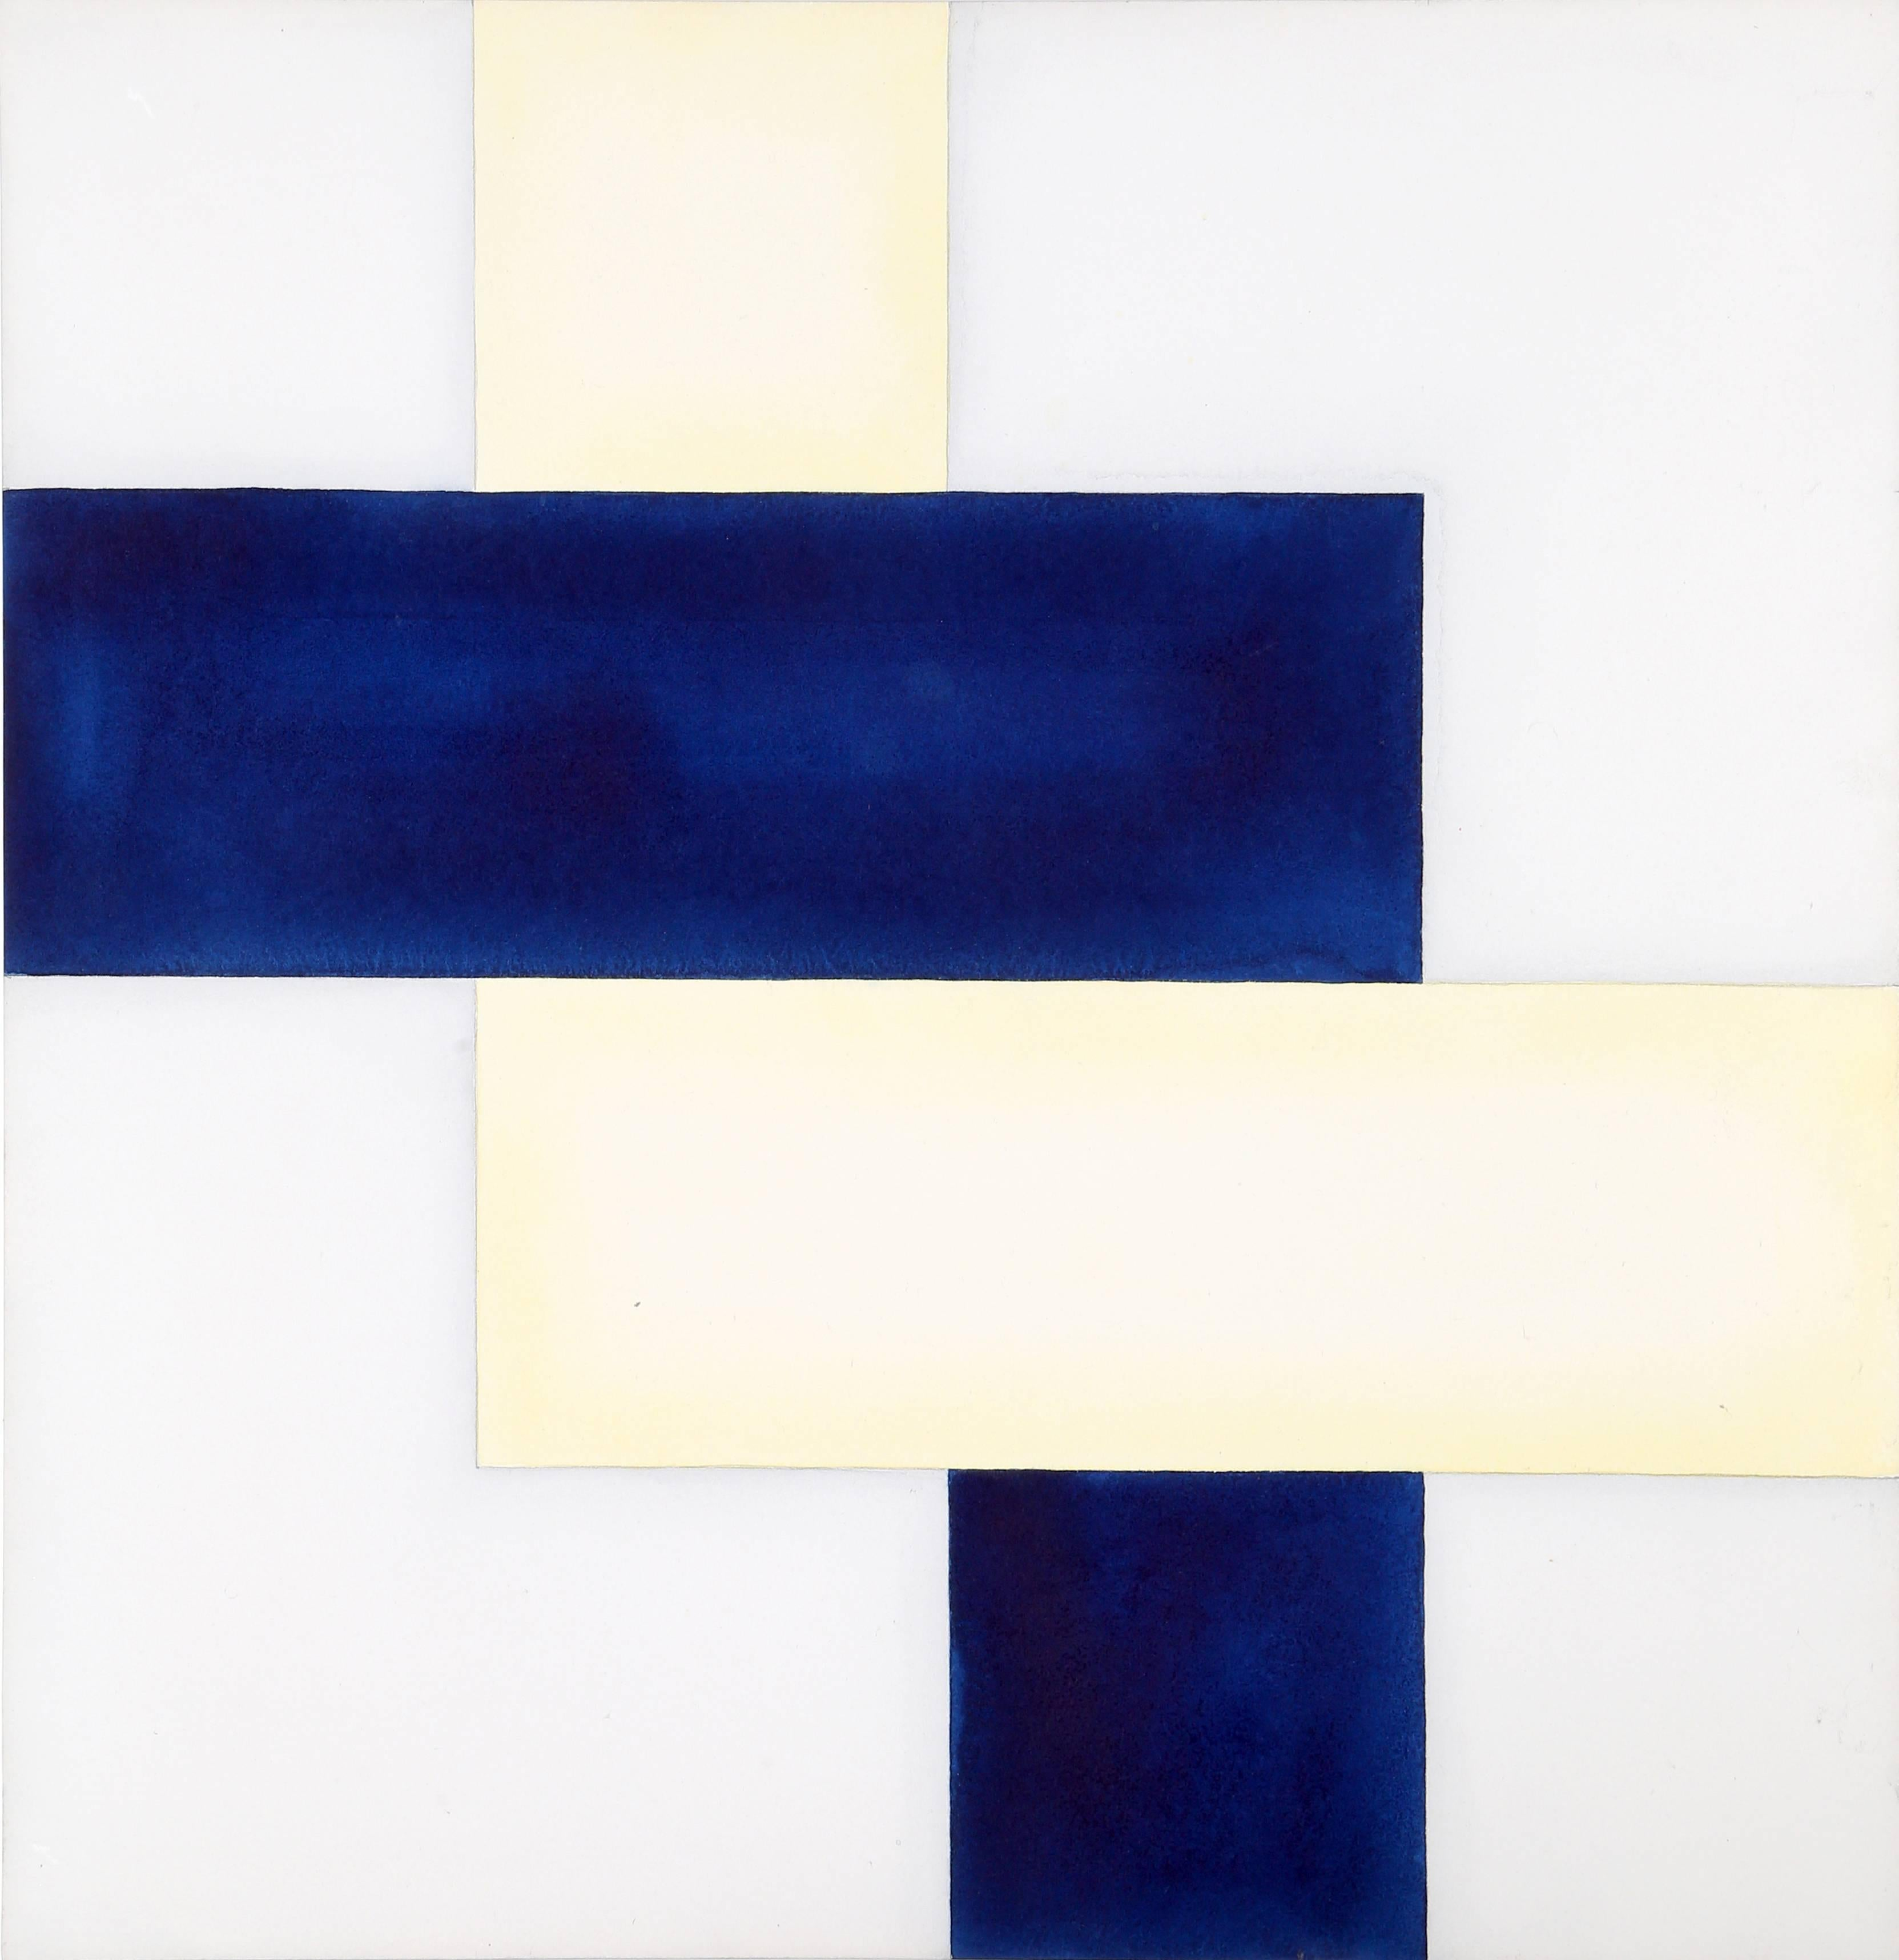 Minimalist Geometric Painting by Patsy Krebs